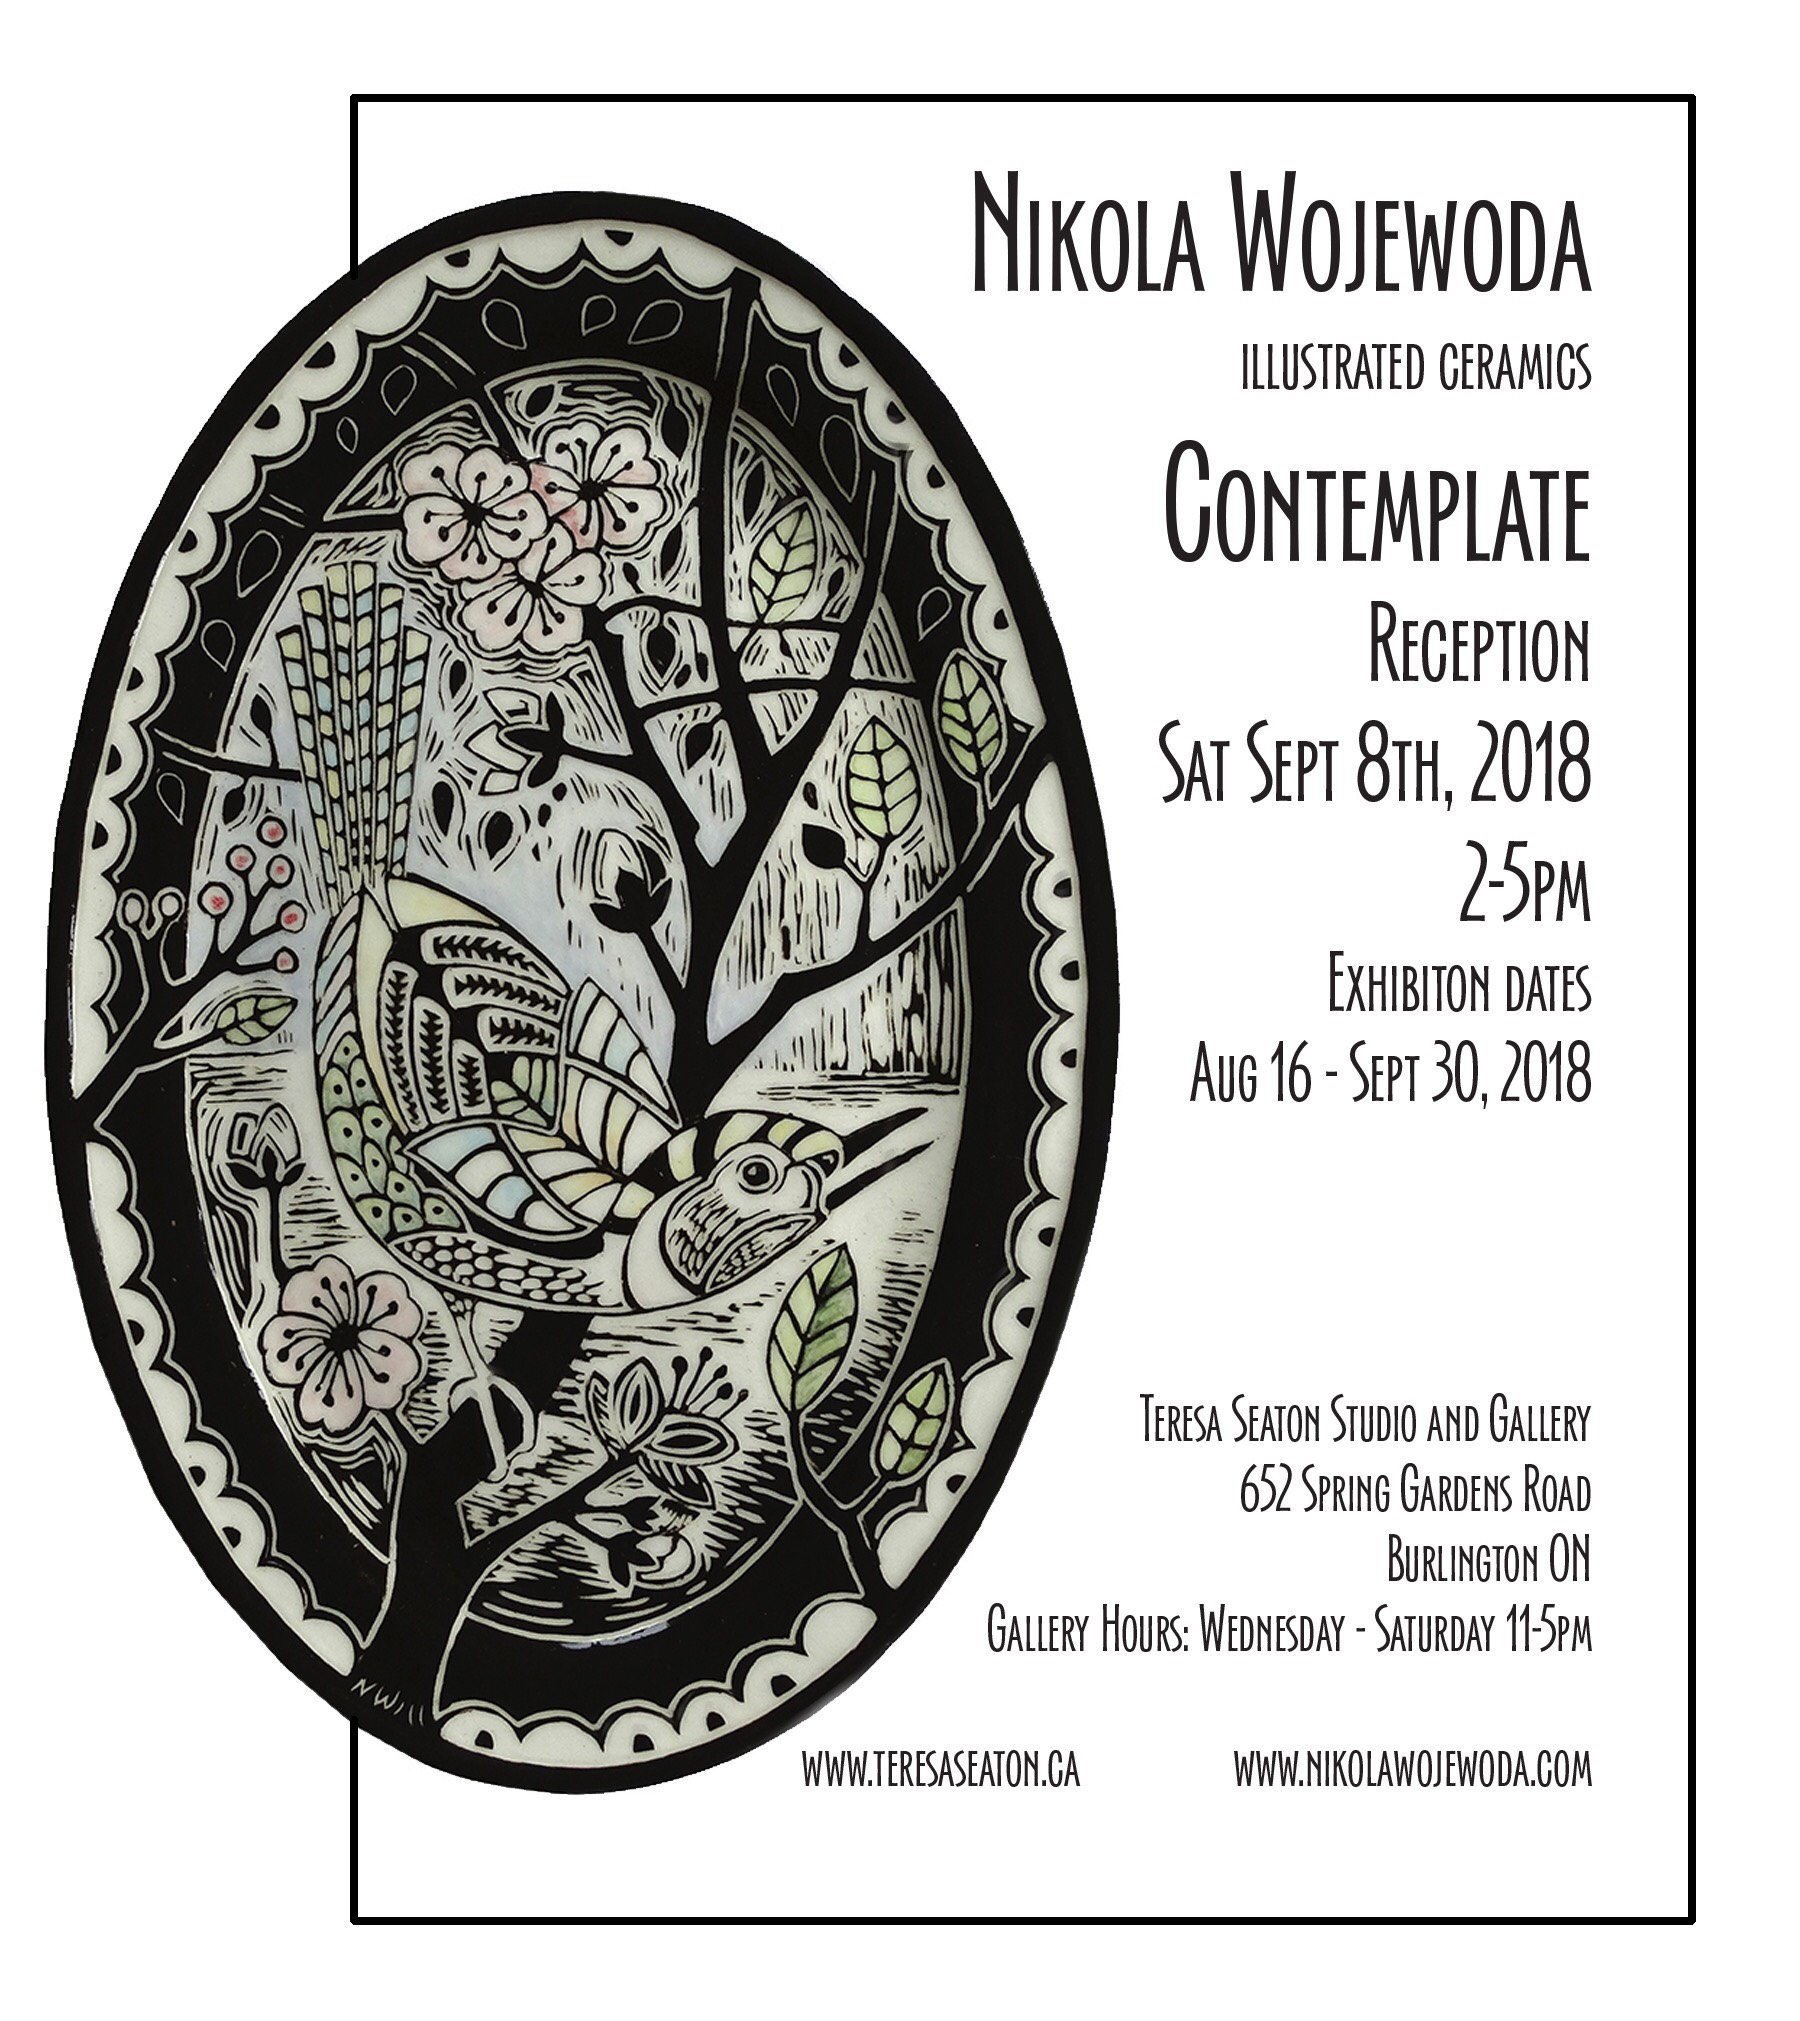 Nikola Wojewoda,  Illustrated Ceramics Exhibition.jpg